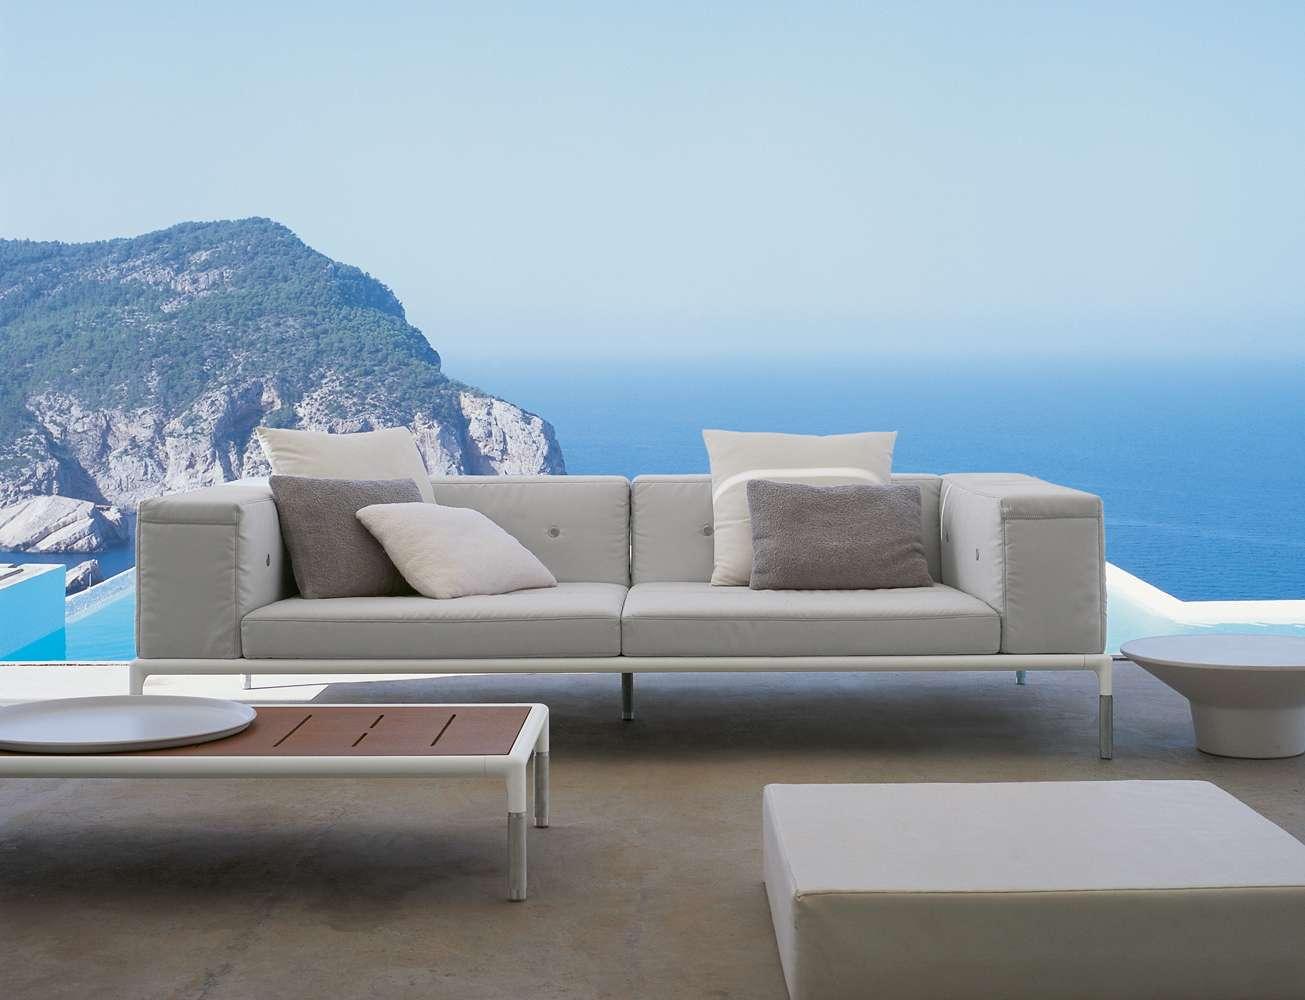 Squarcina b b italia outdoor springtime sofa squarcina for B and b italia outdoor